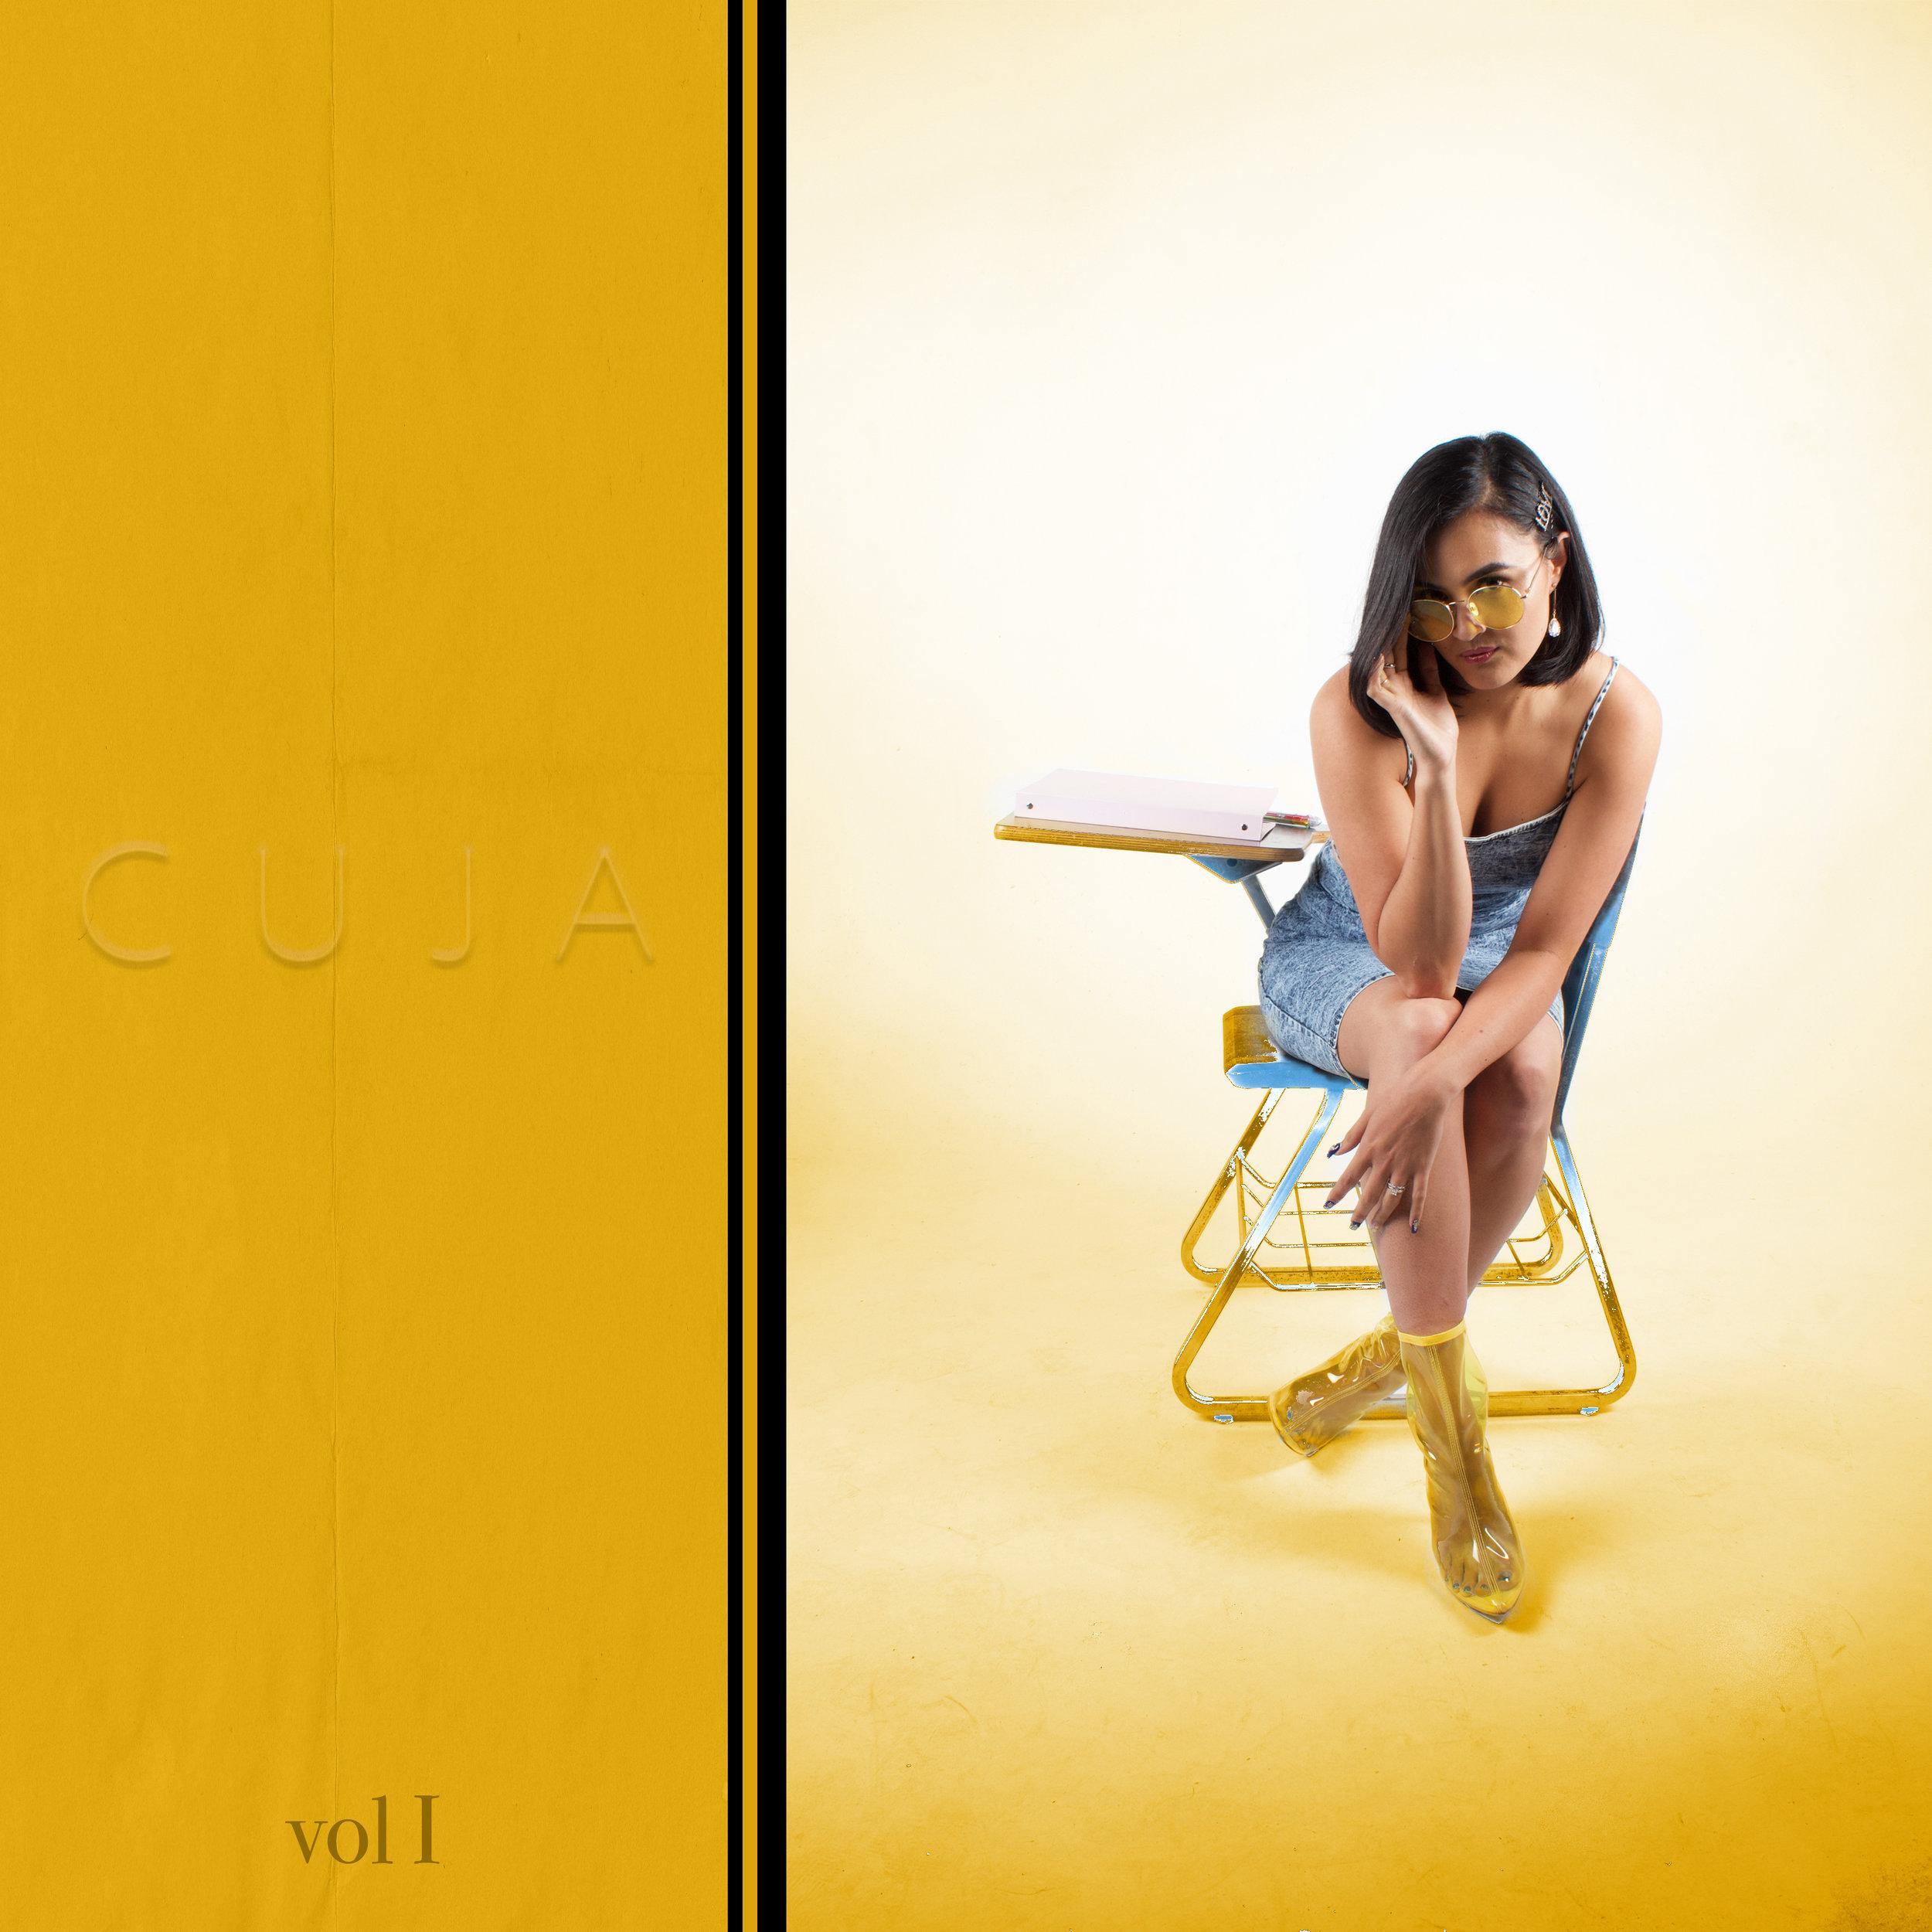 Cuja_EP_Vol1_Coverart.JPG